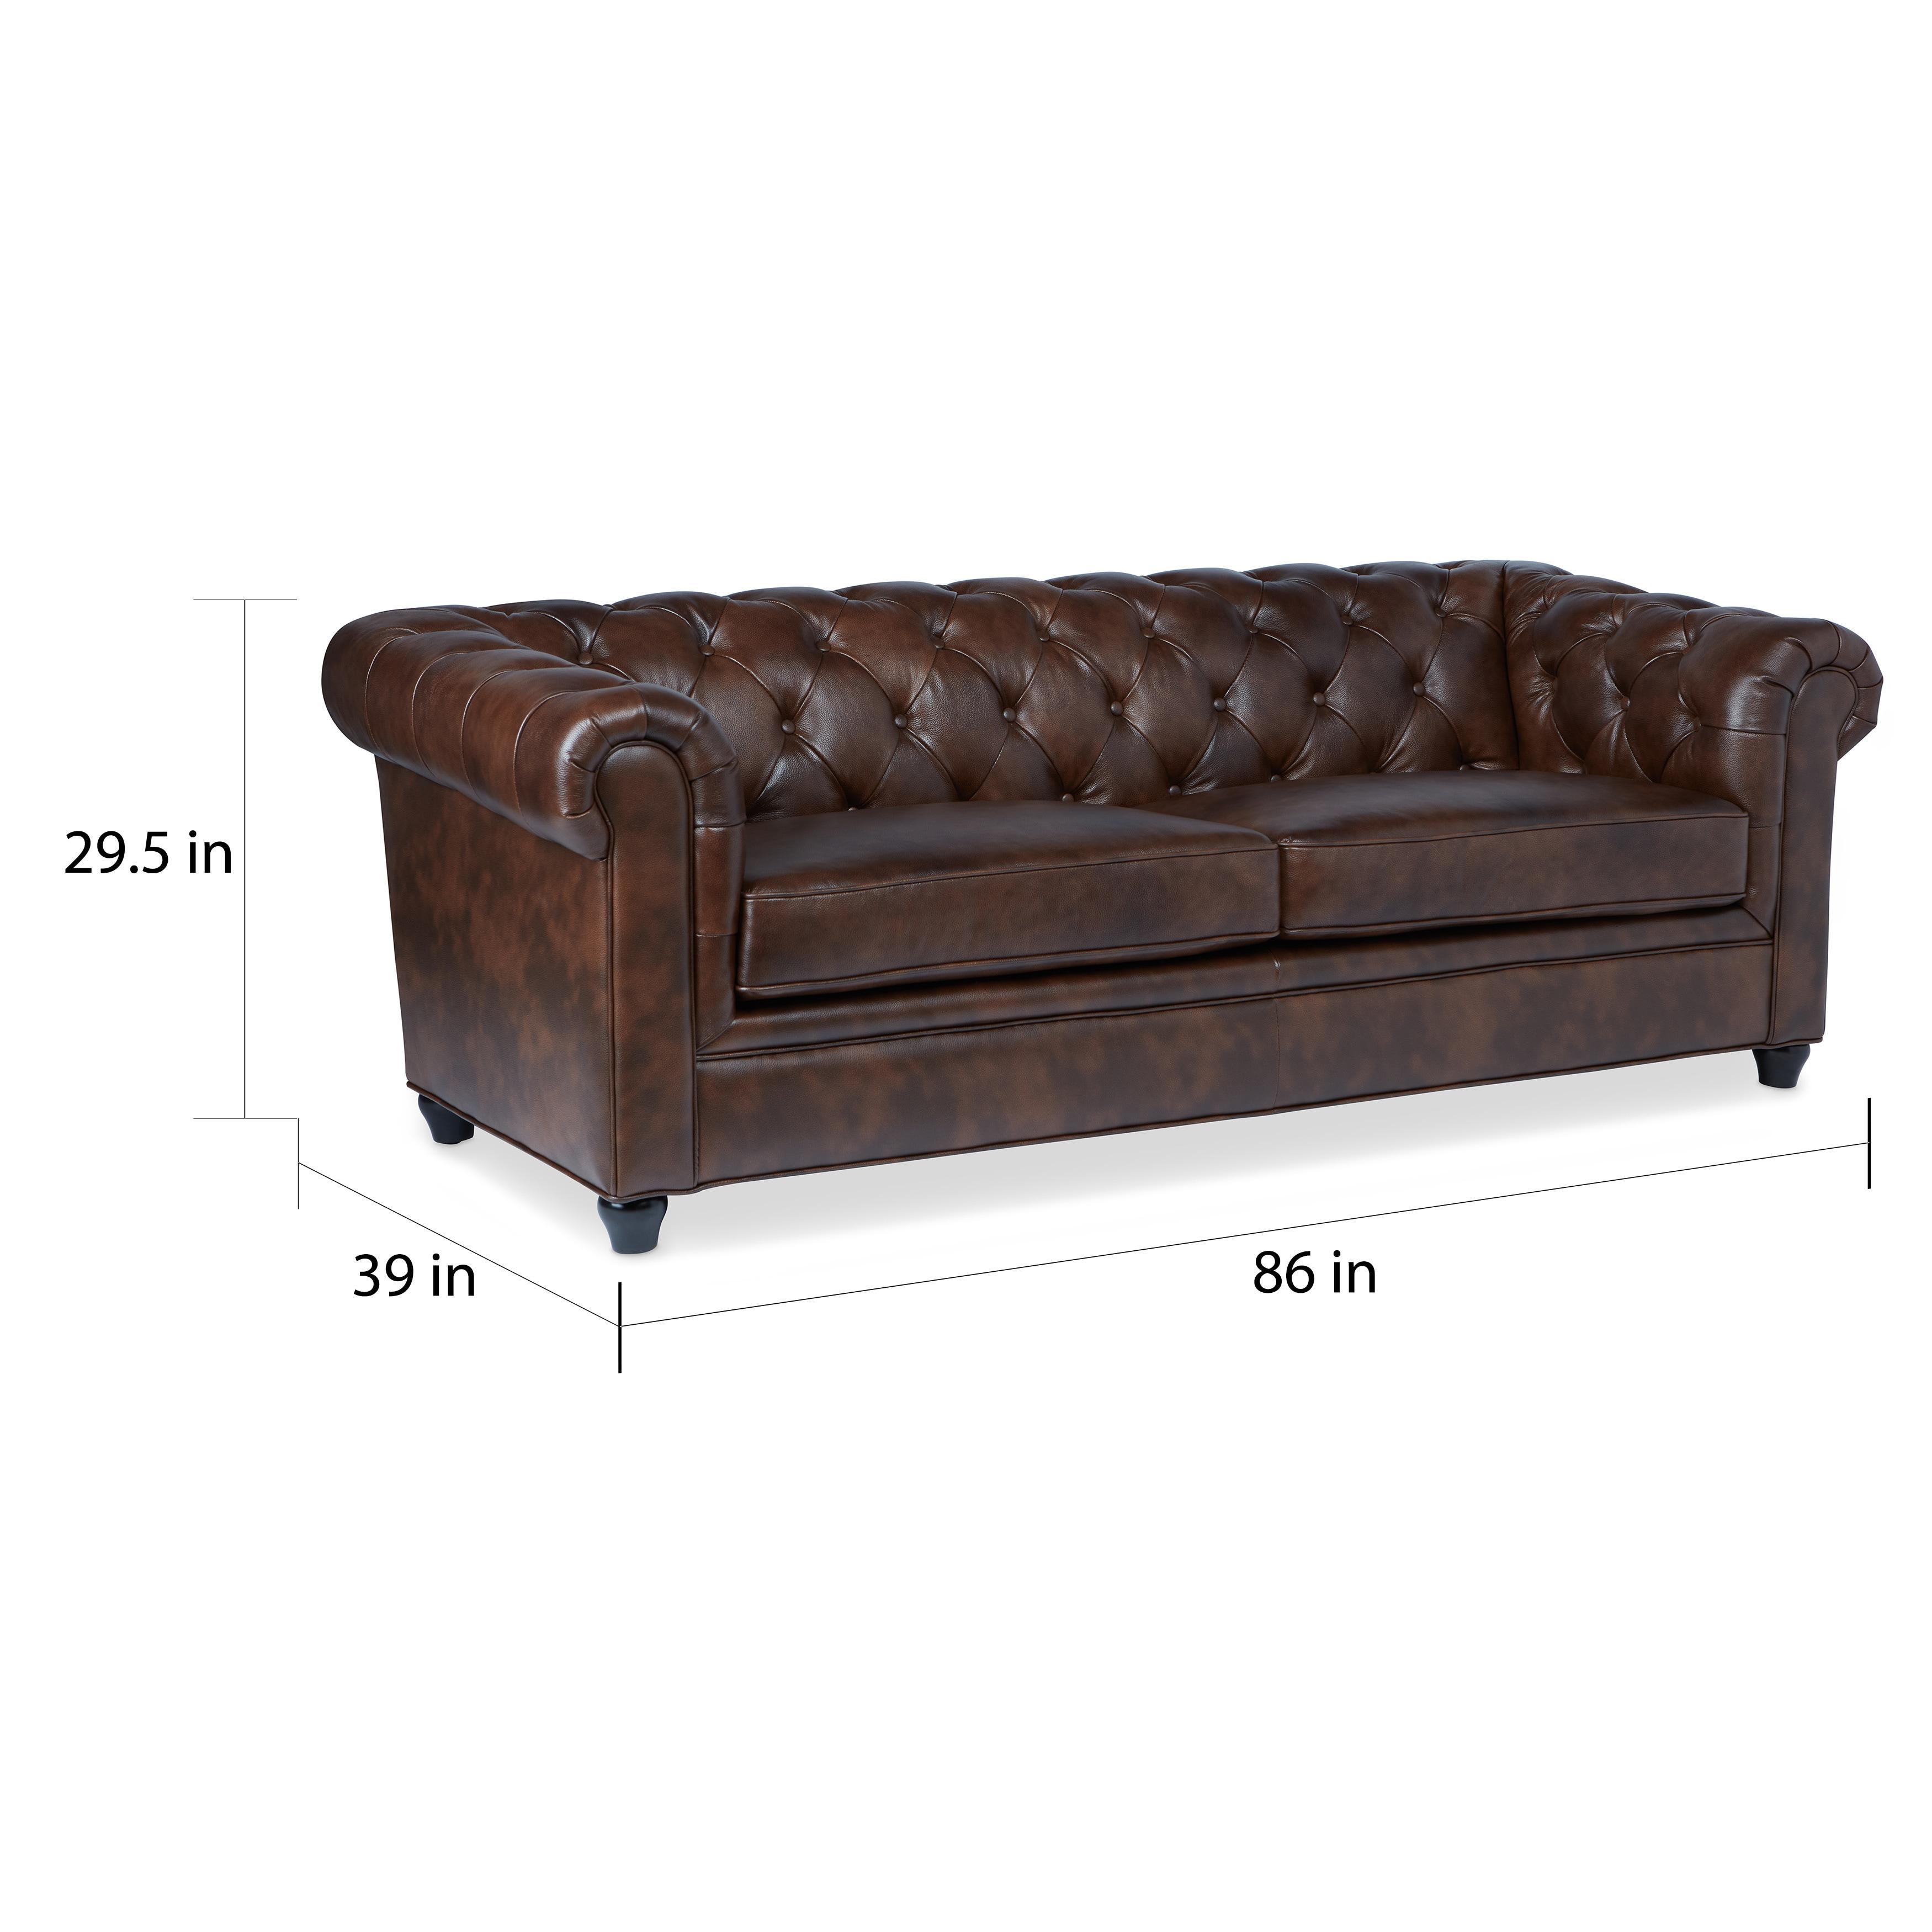 Shop Abbyson Tuscan Top Grain Leather Chesterfield Sofa - On Sale ...